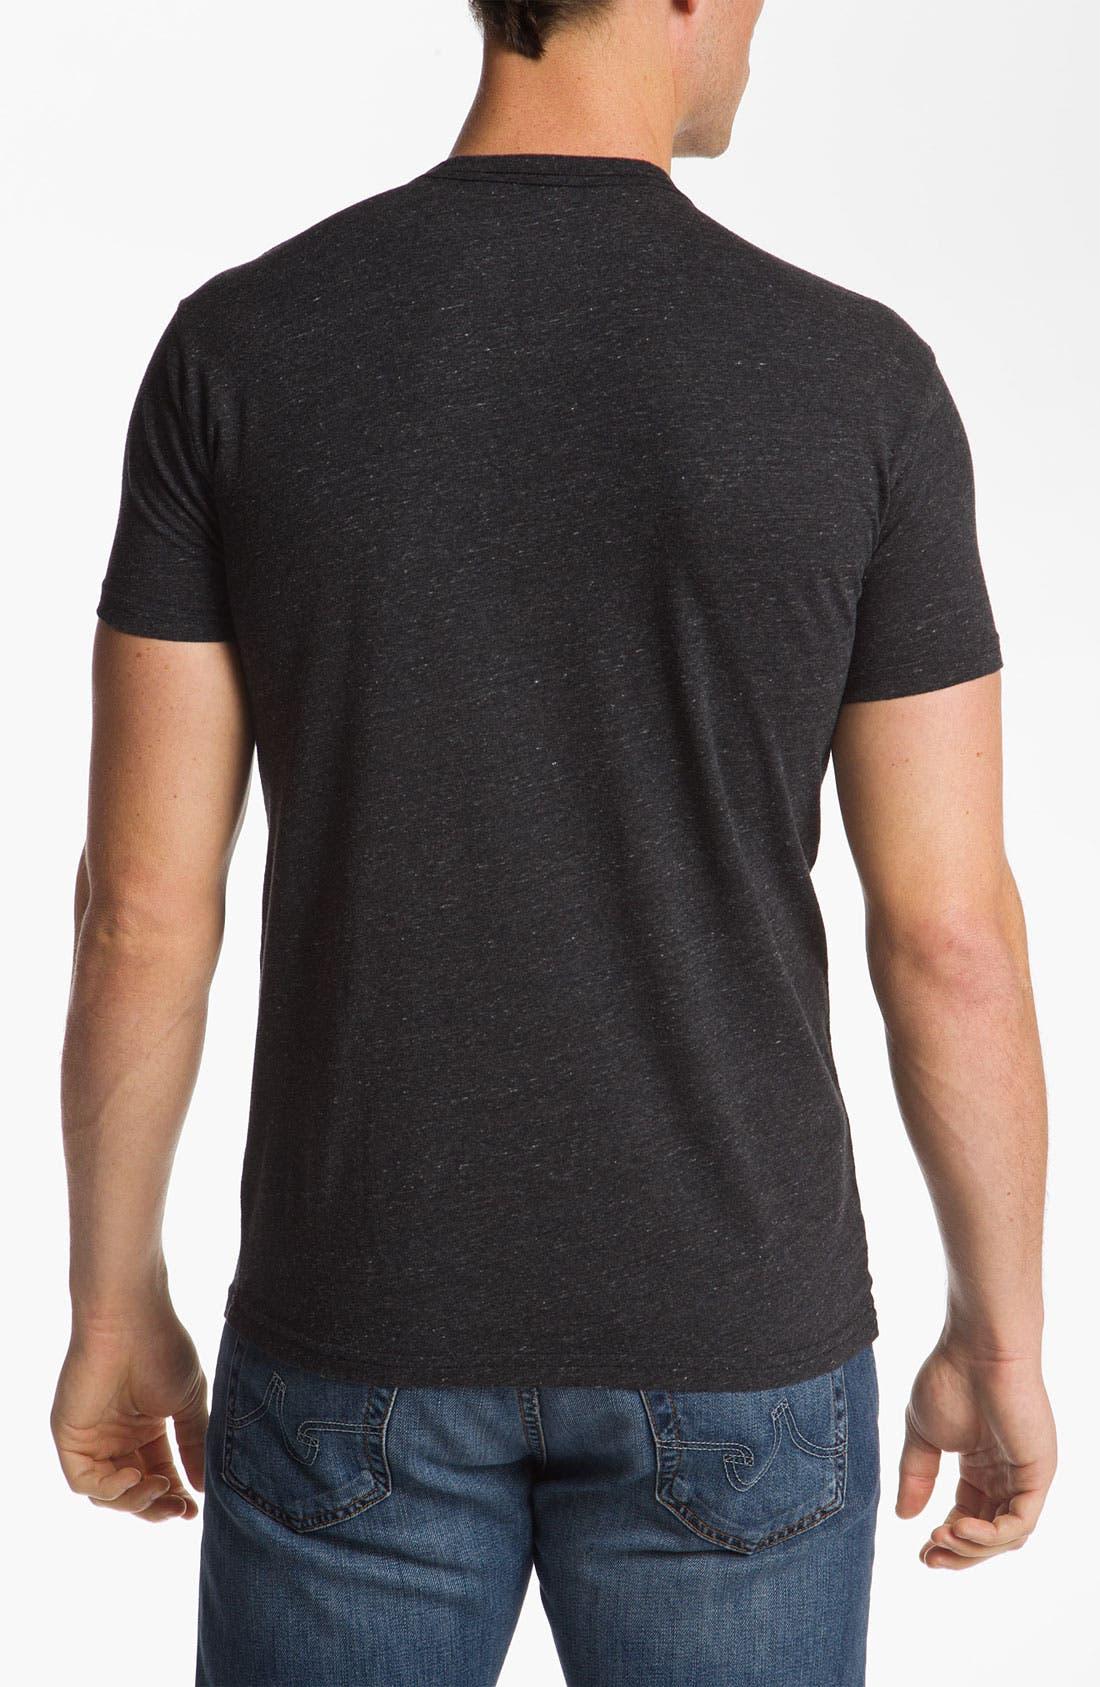 The Original Retro Brand 'University of Washington Huskies' T-Shirt,                             Alternate thumbnail 2, color,                             001